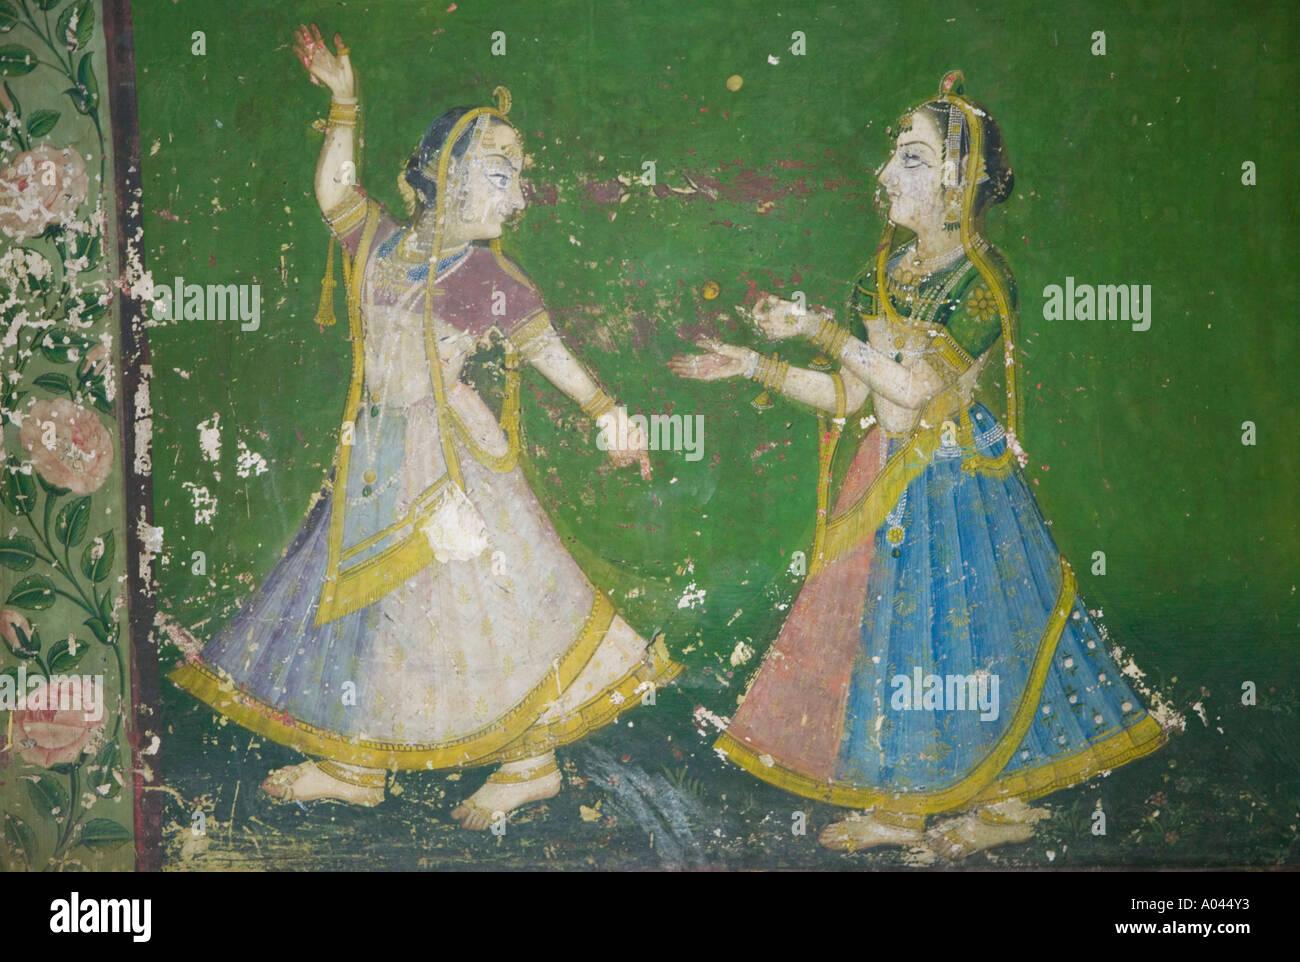 Indian Wall Art, City Palace, Udaipur, Rajasthan, India